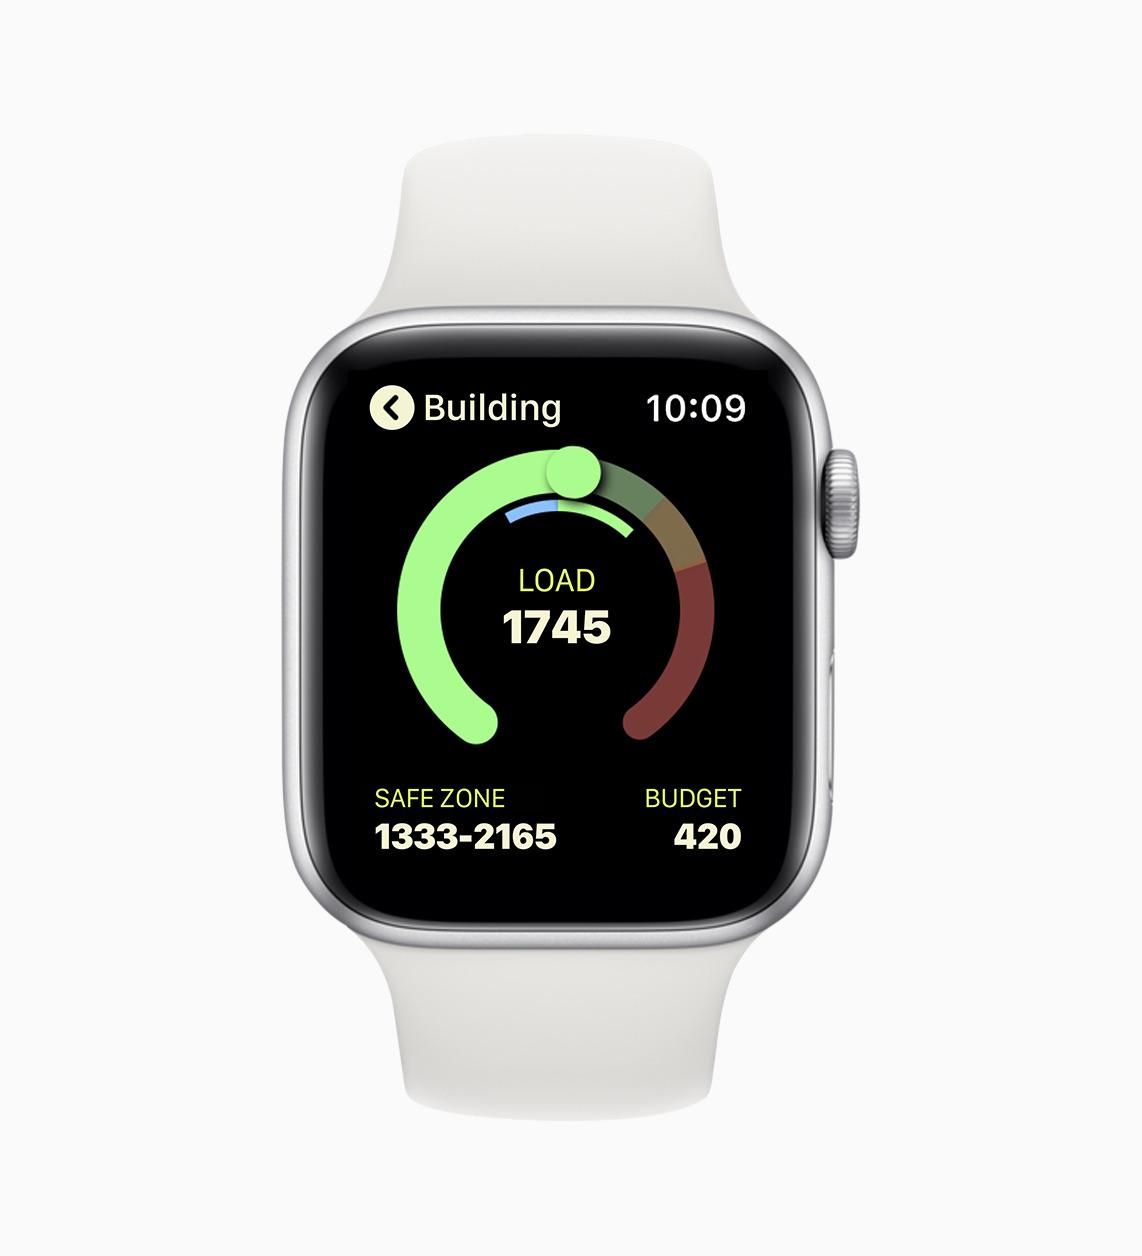 Apple Watch cricket